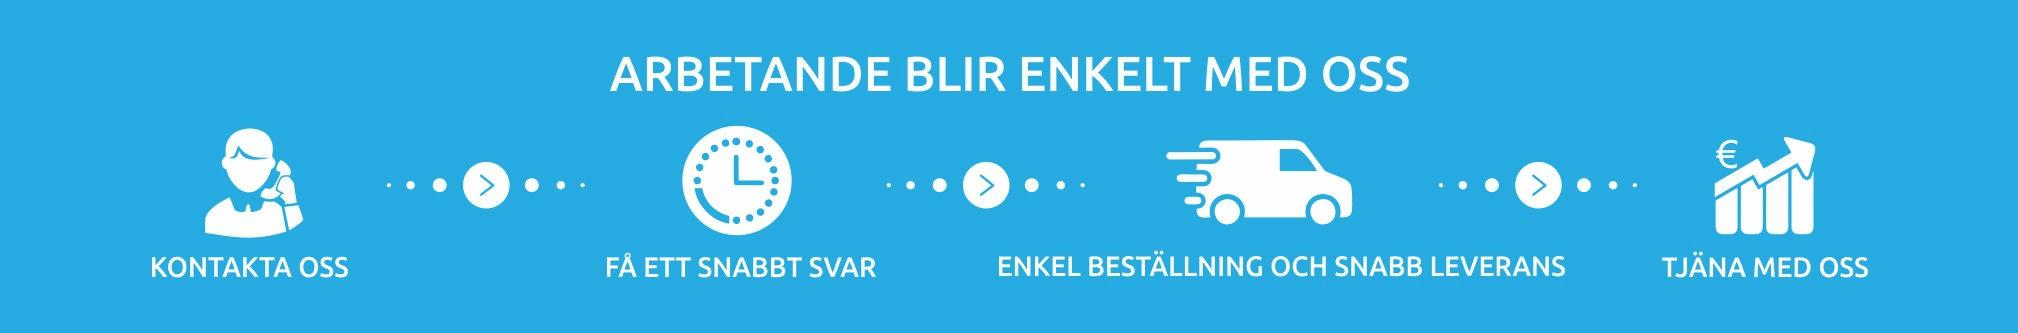 naudos-klientams-ikonos-svedu-kalbaa